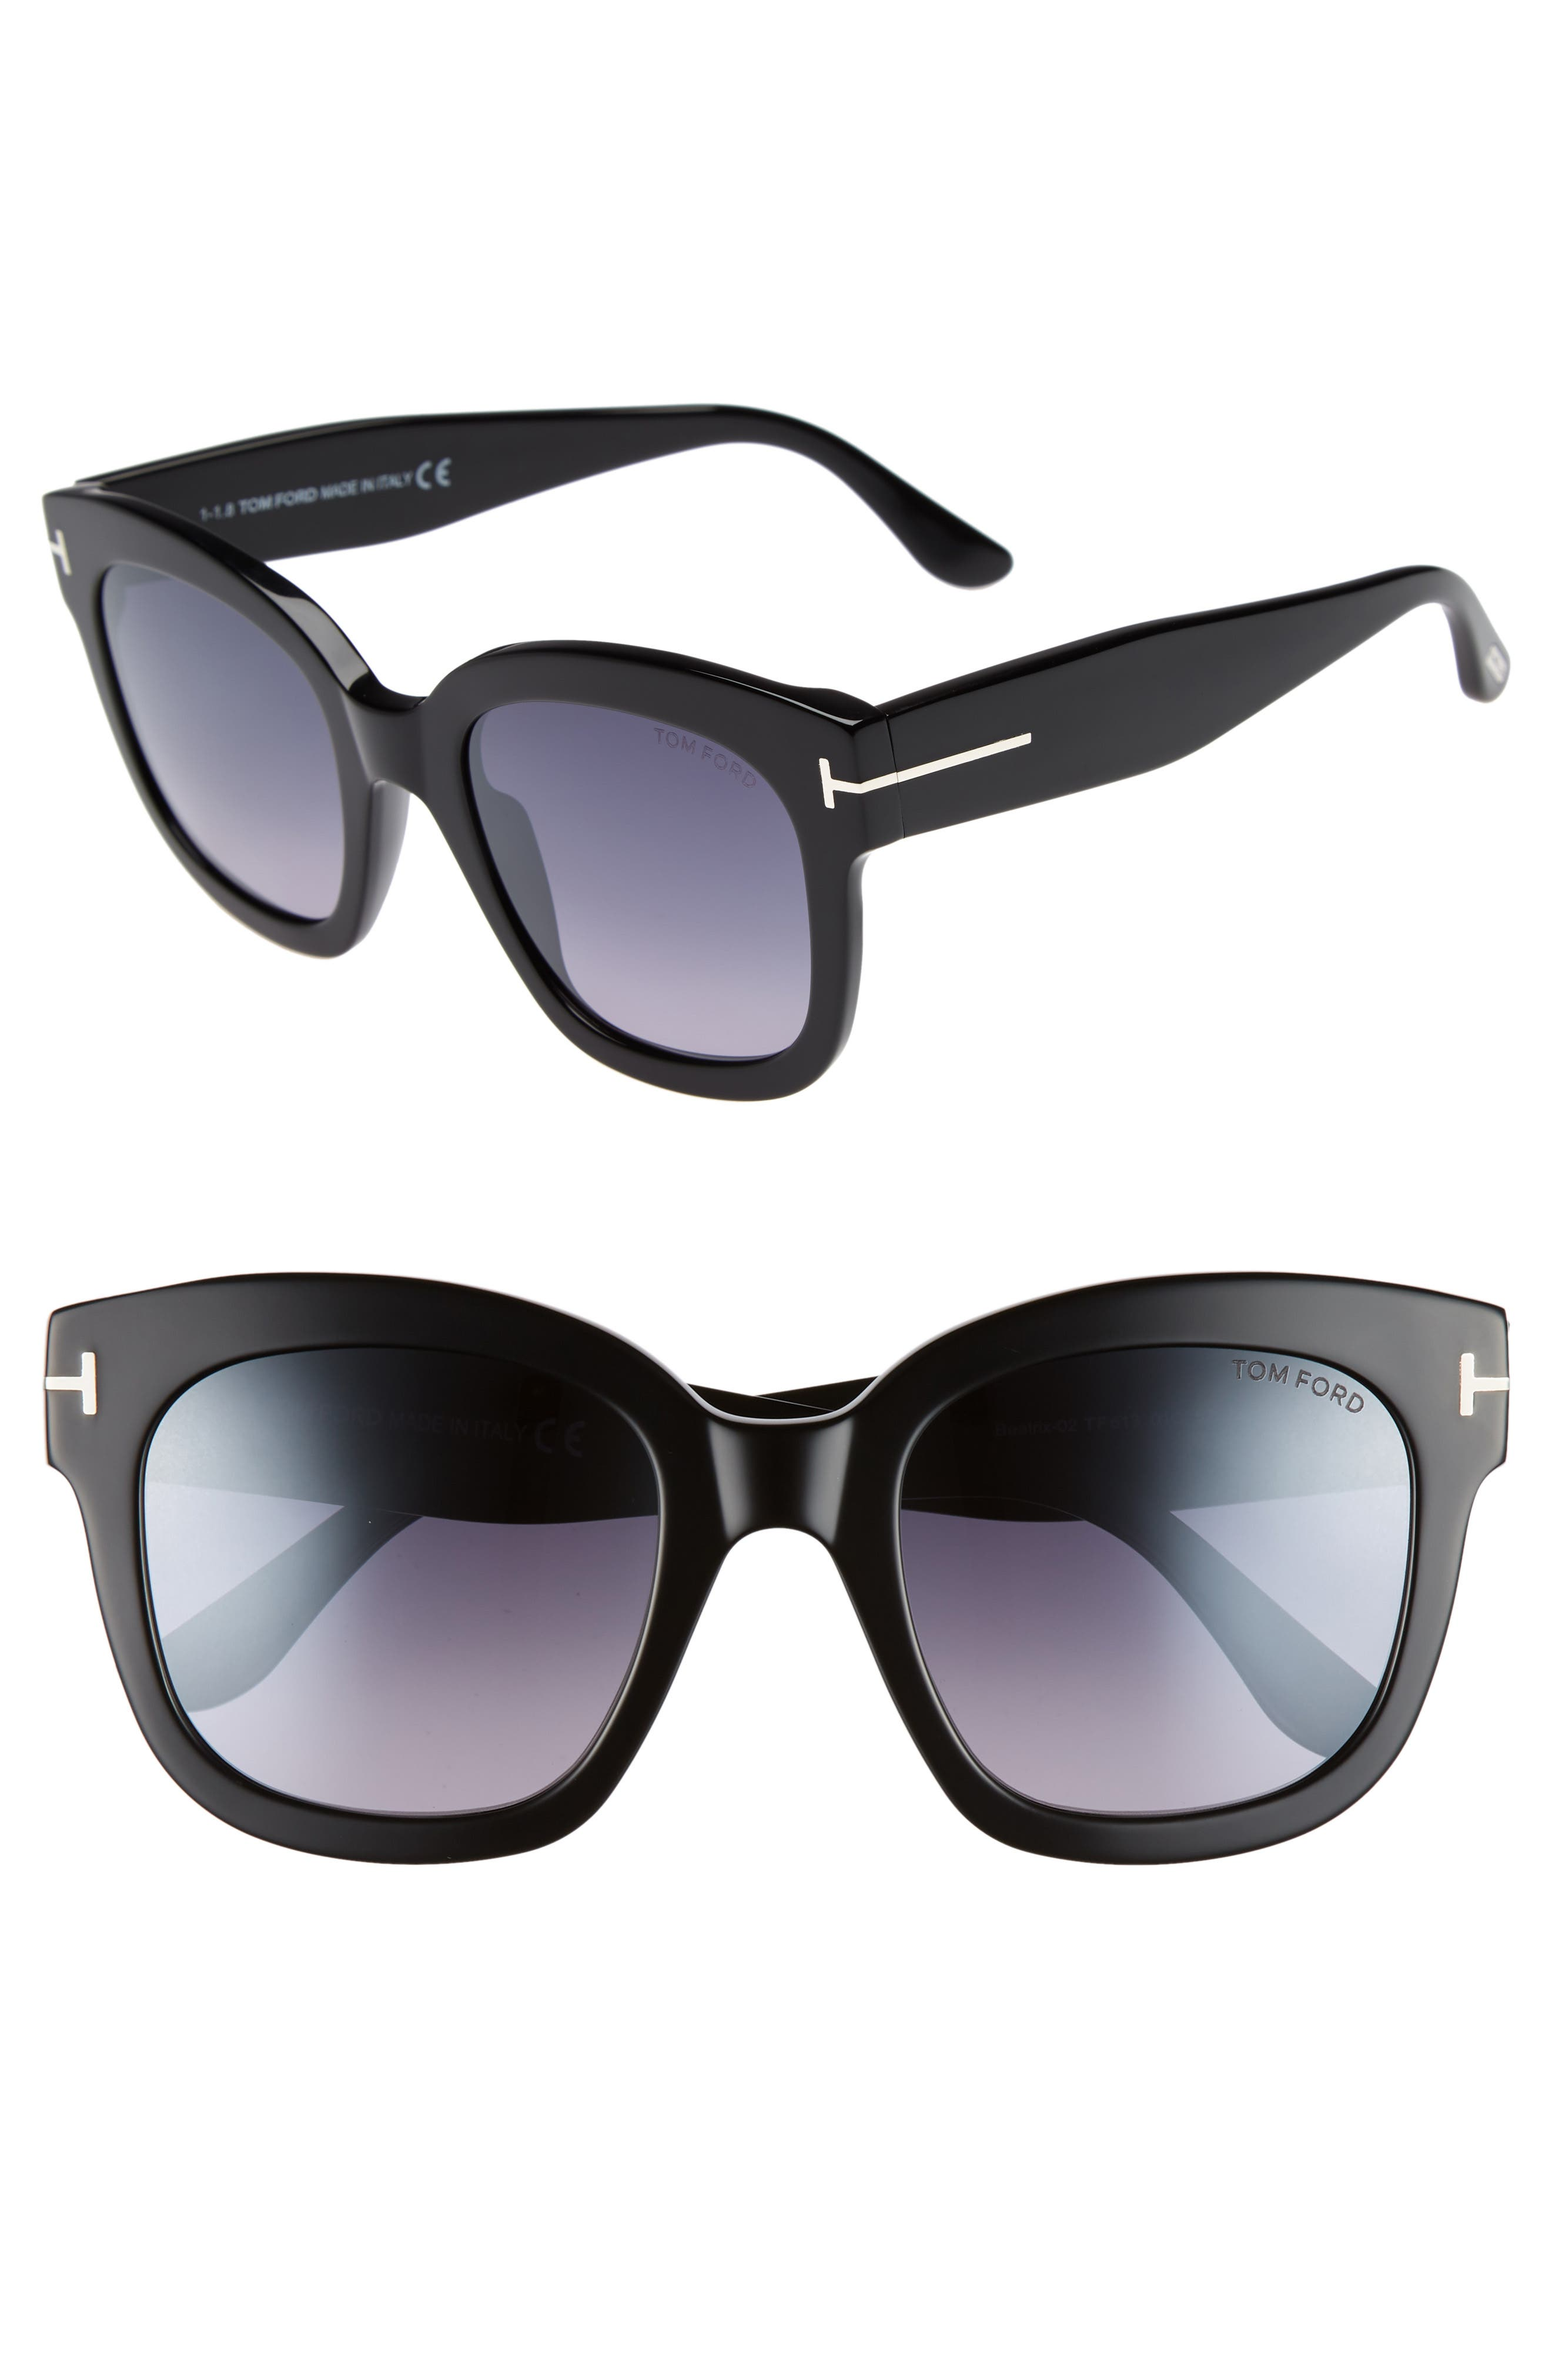 Tom Ford Beatrix 52mm Sunglasses Nordstrom